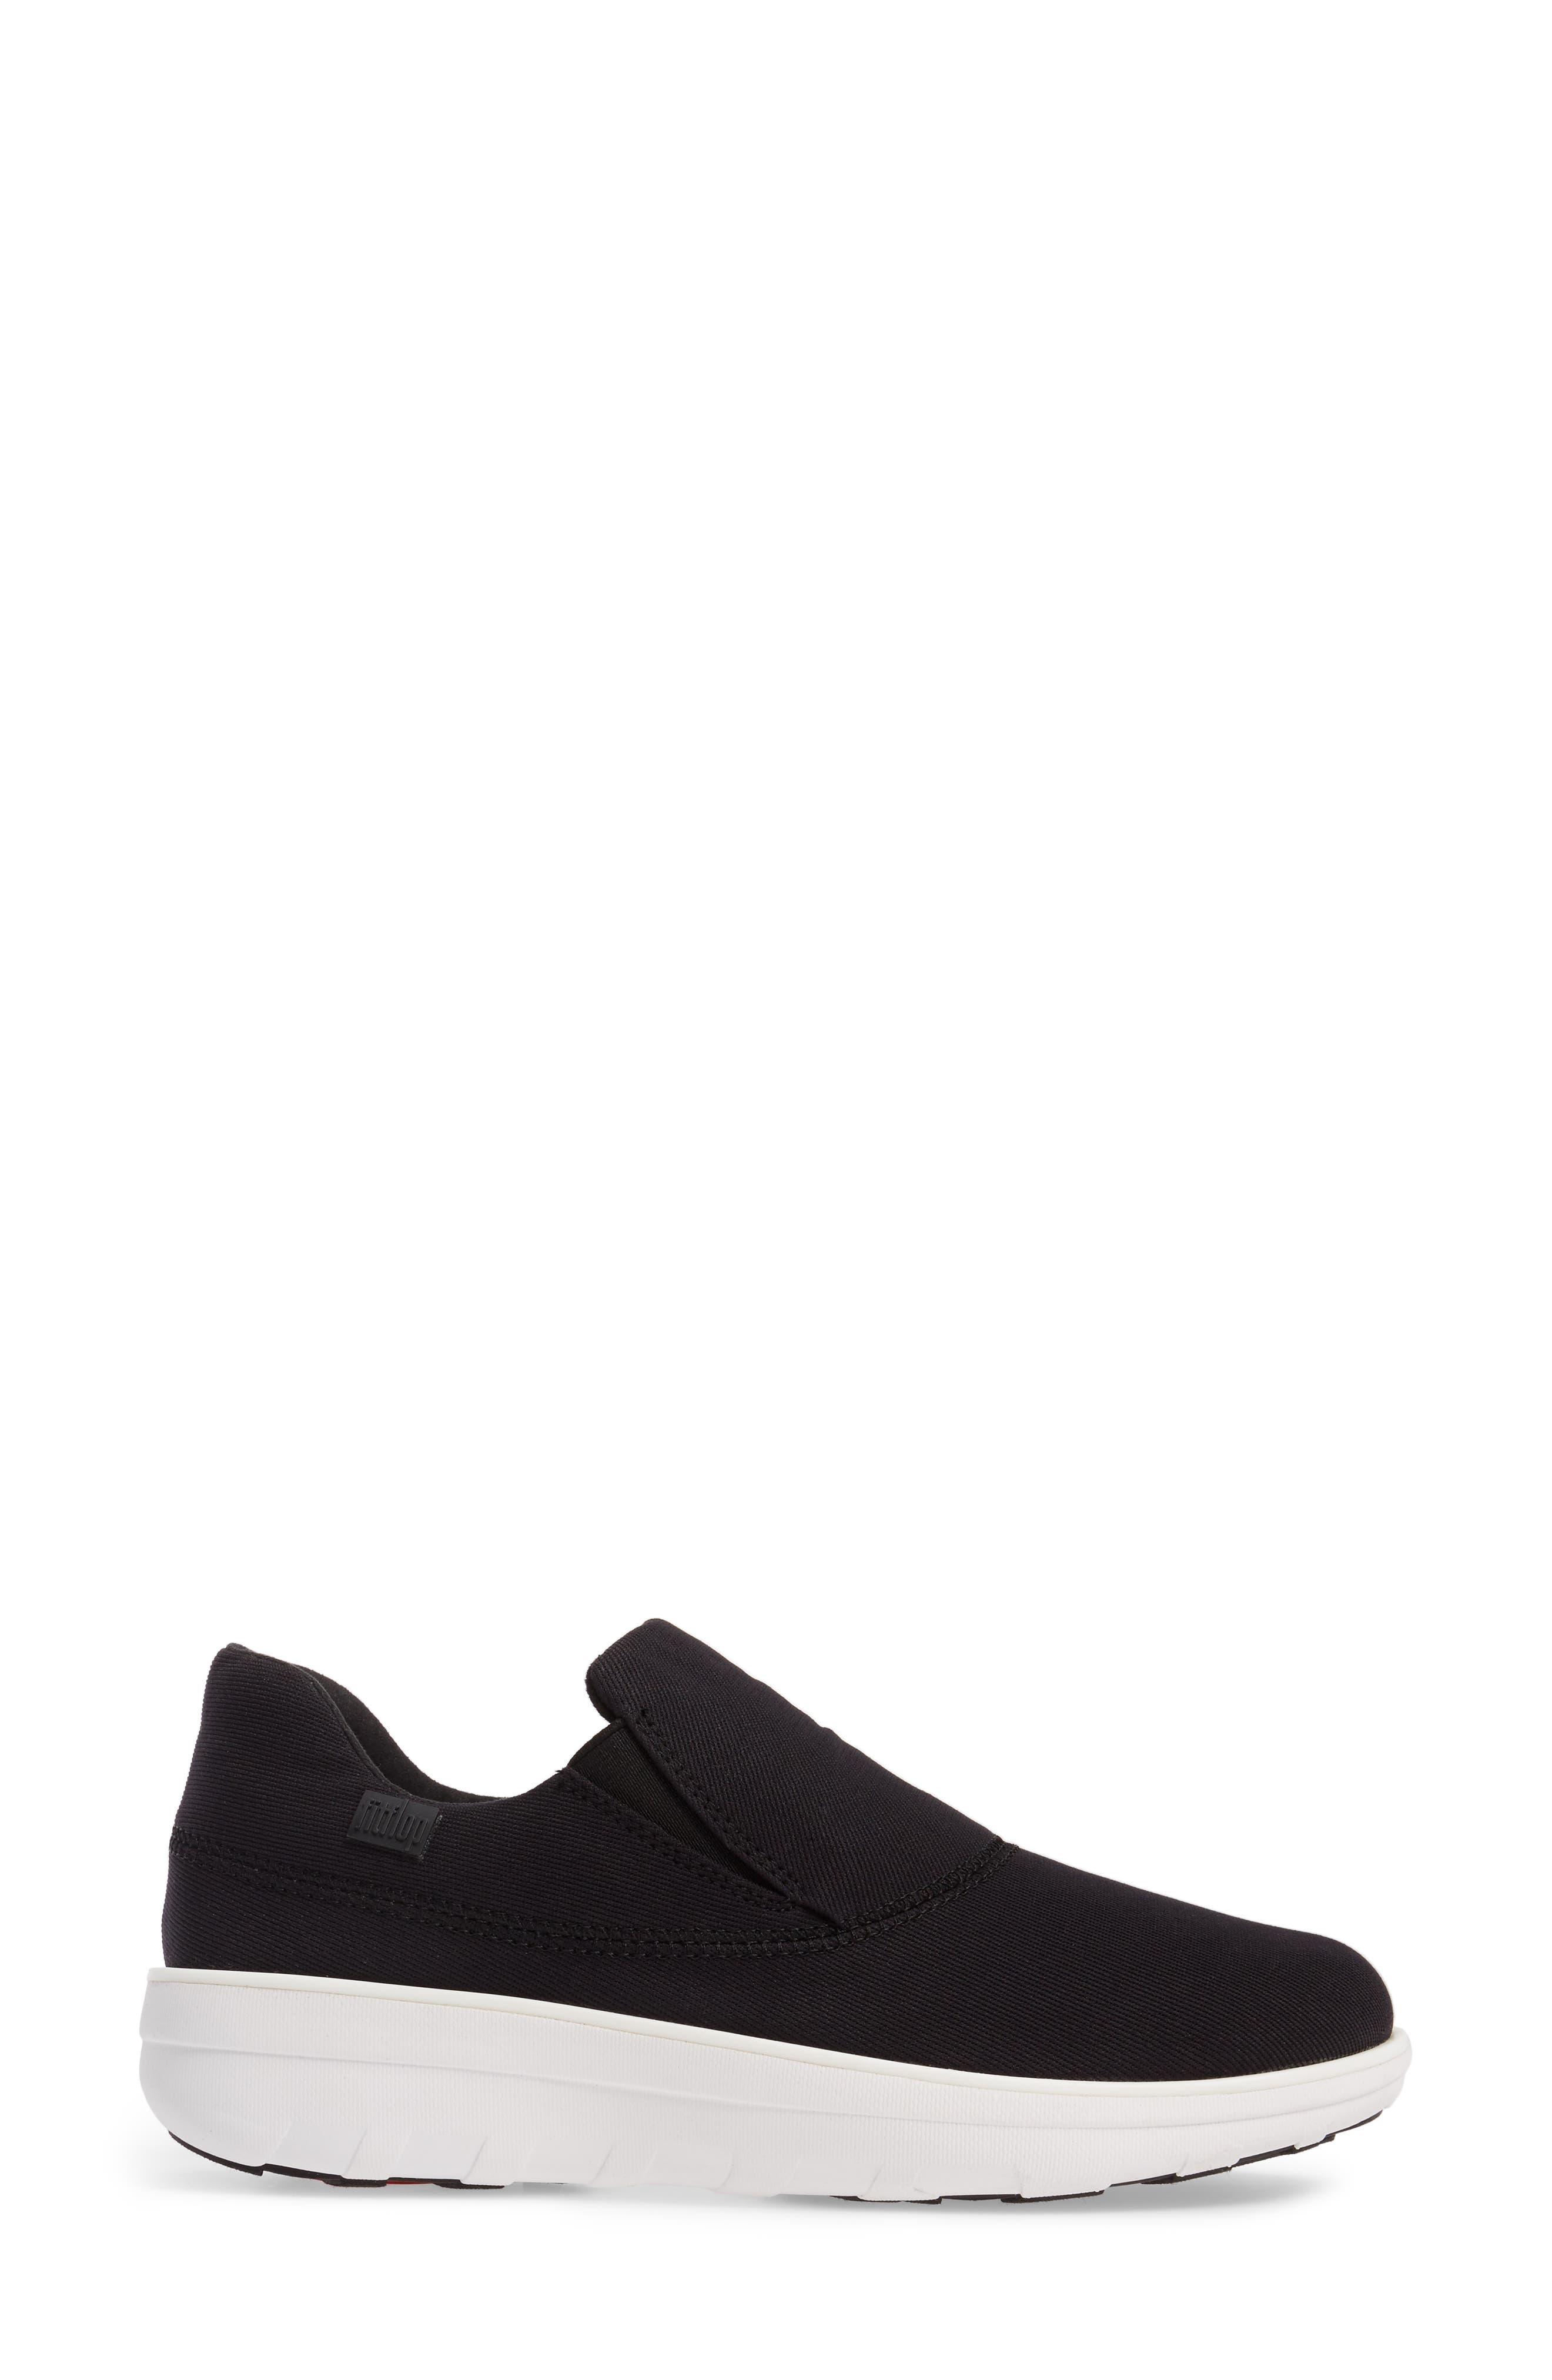 Alternate Image 3  - FitFlop Loaff Platform Slip-On Sneaker (Women)